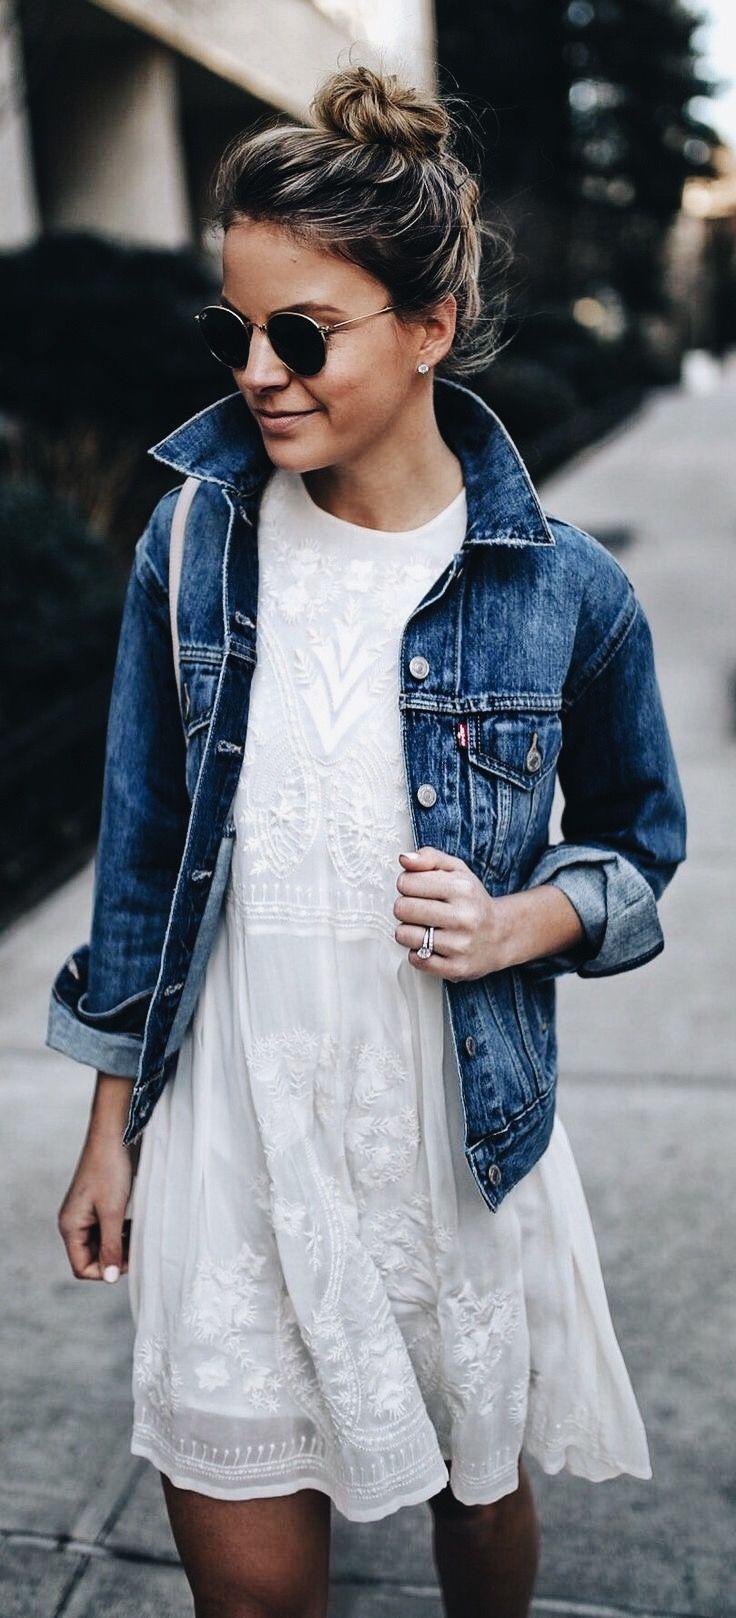 Denim and White dress